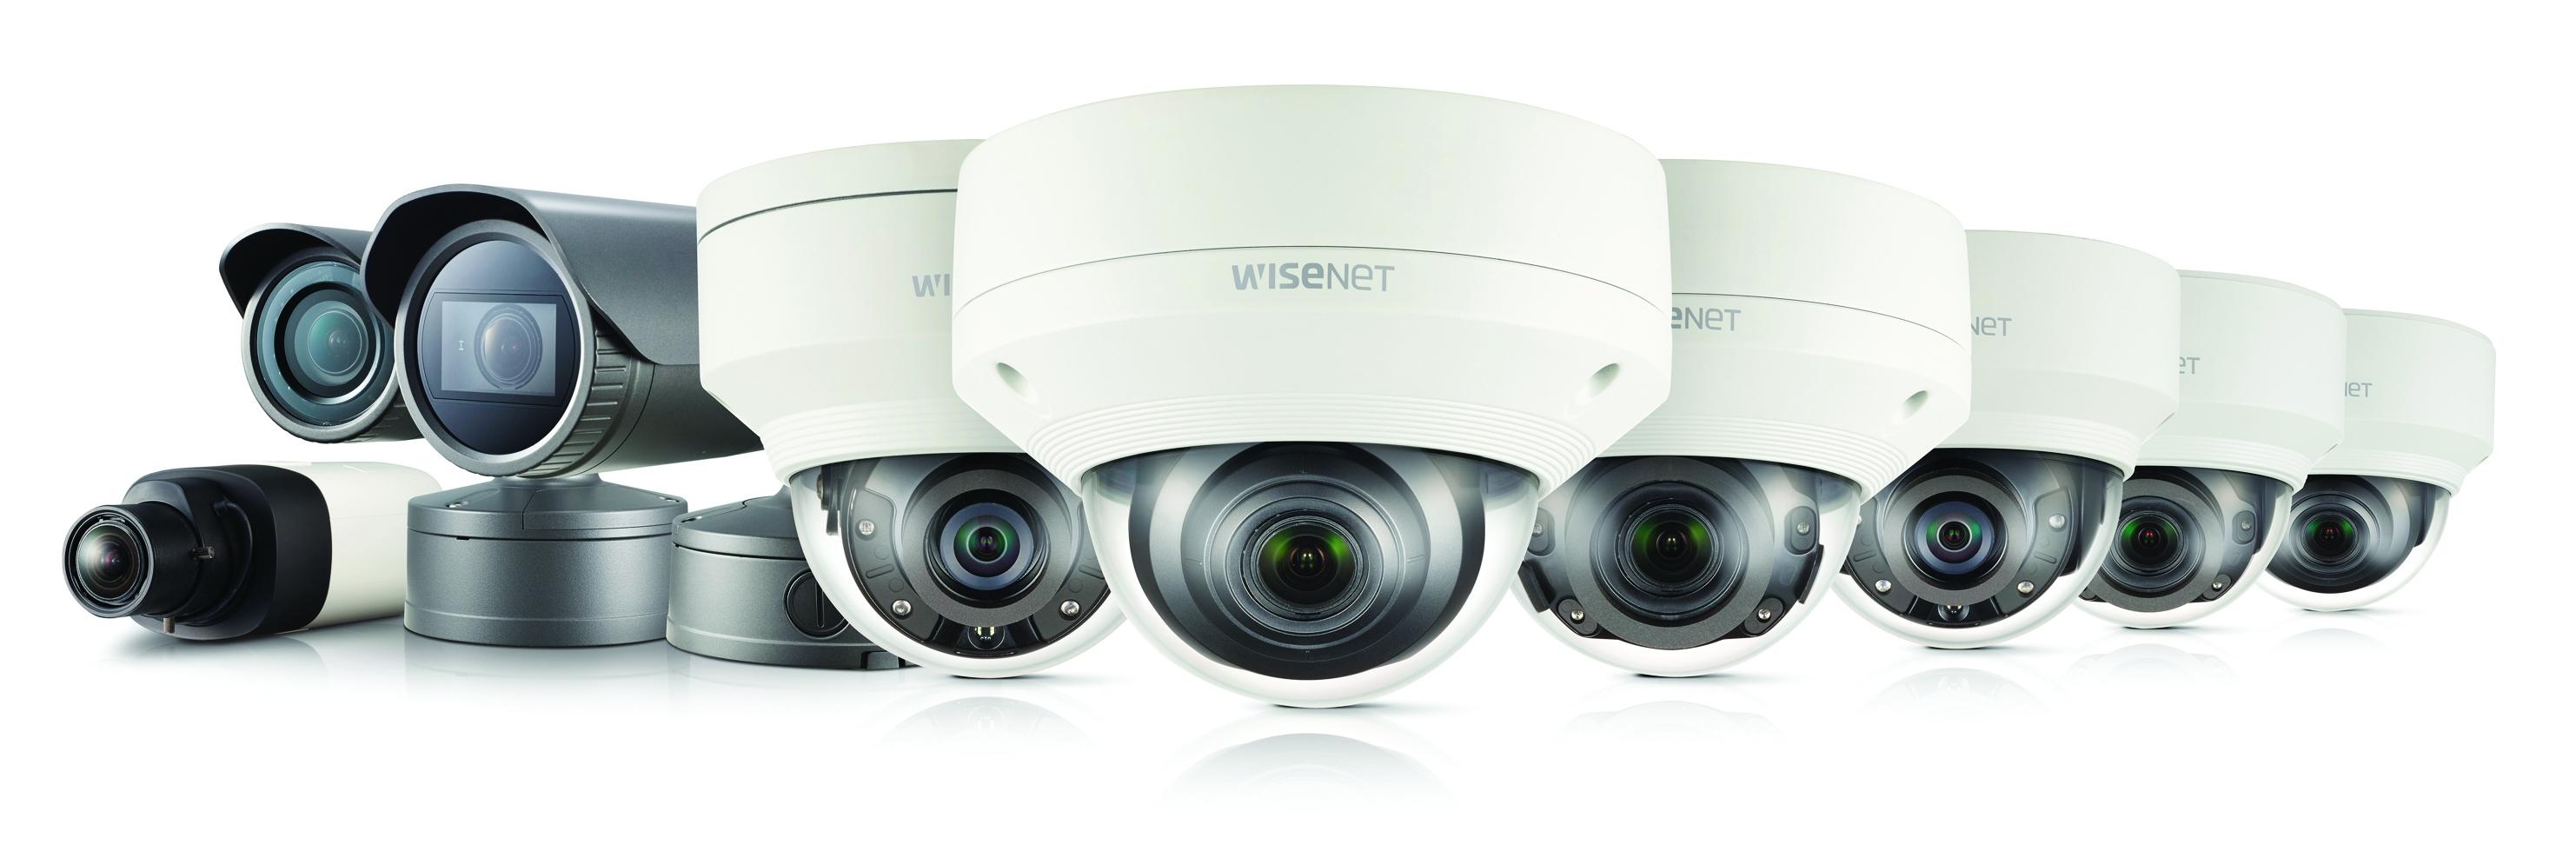 Wisenet_X_Series_Cameras